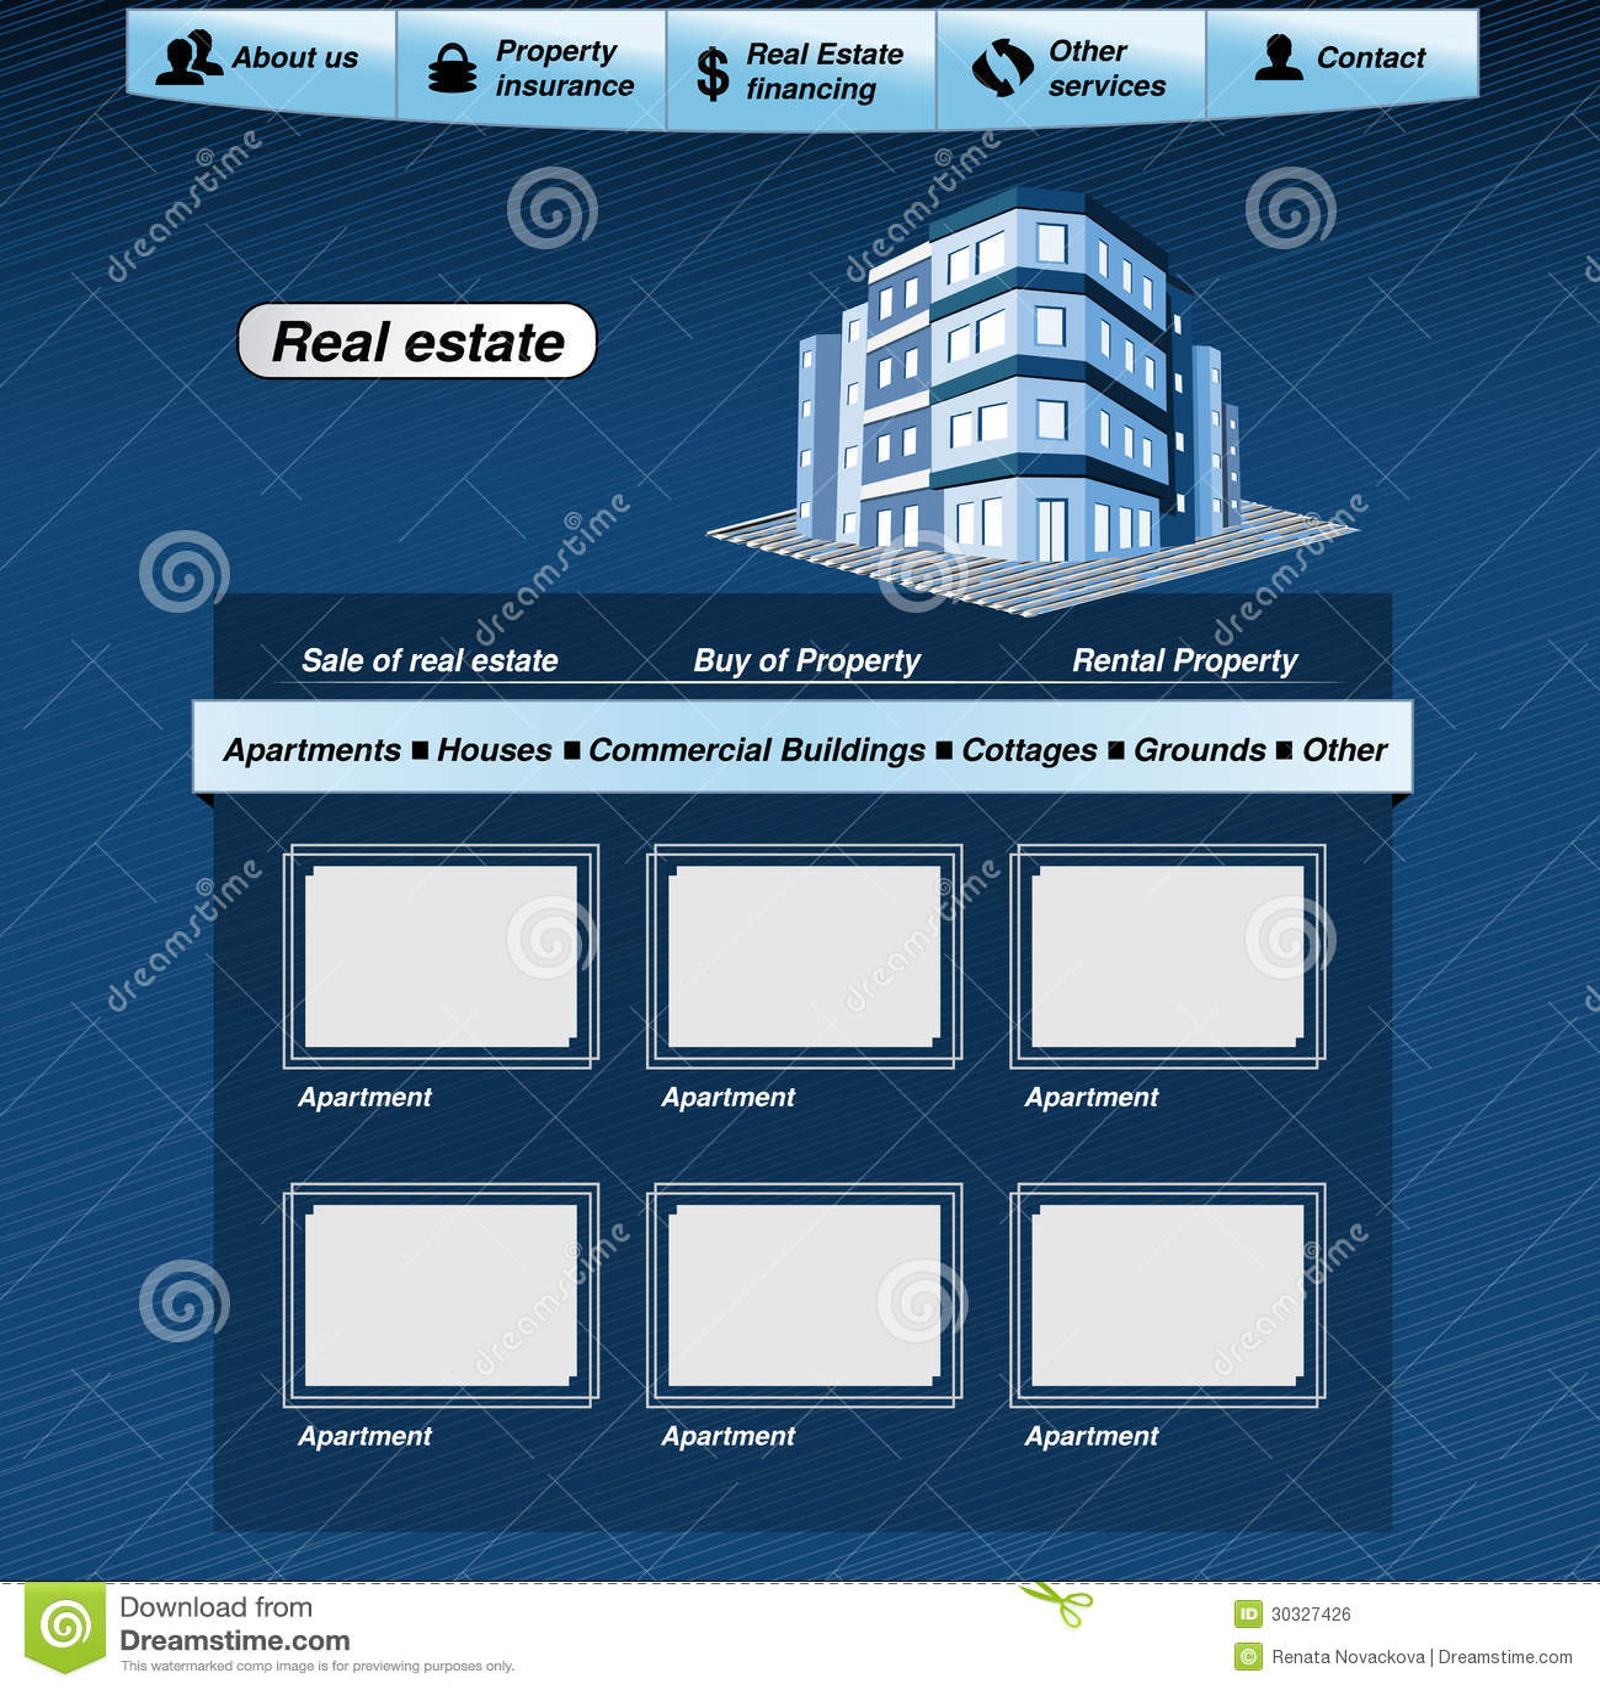 Web Template Real Estate Webdesign Proposal Royalty Free – Real Estate Proposal Template